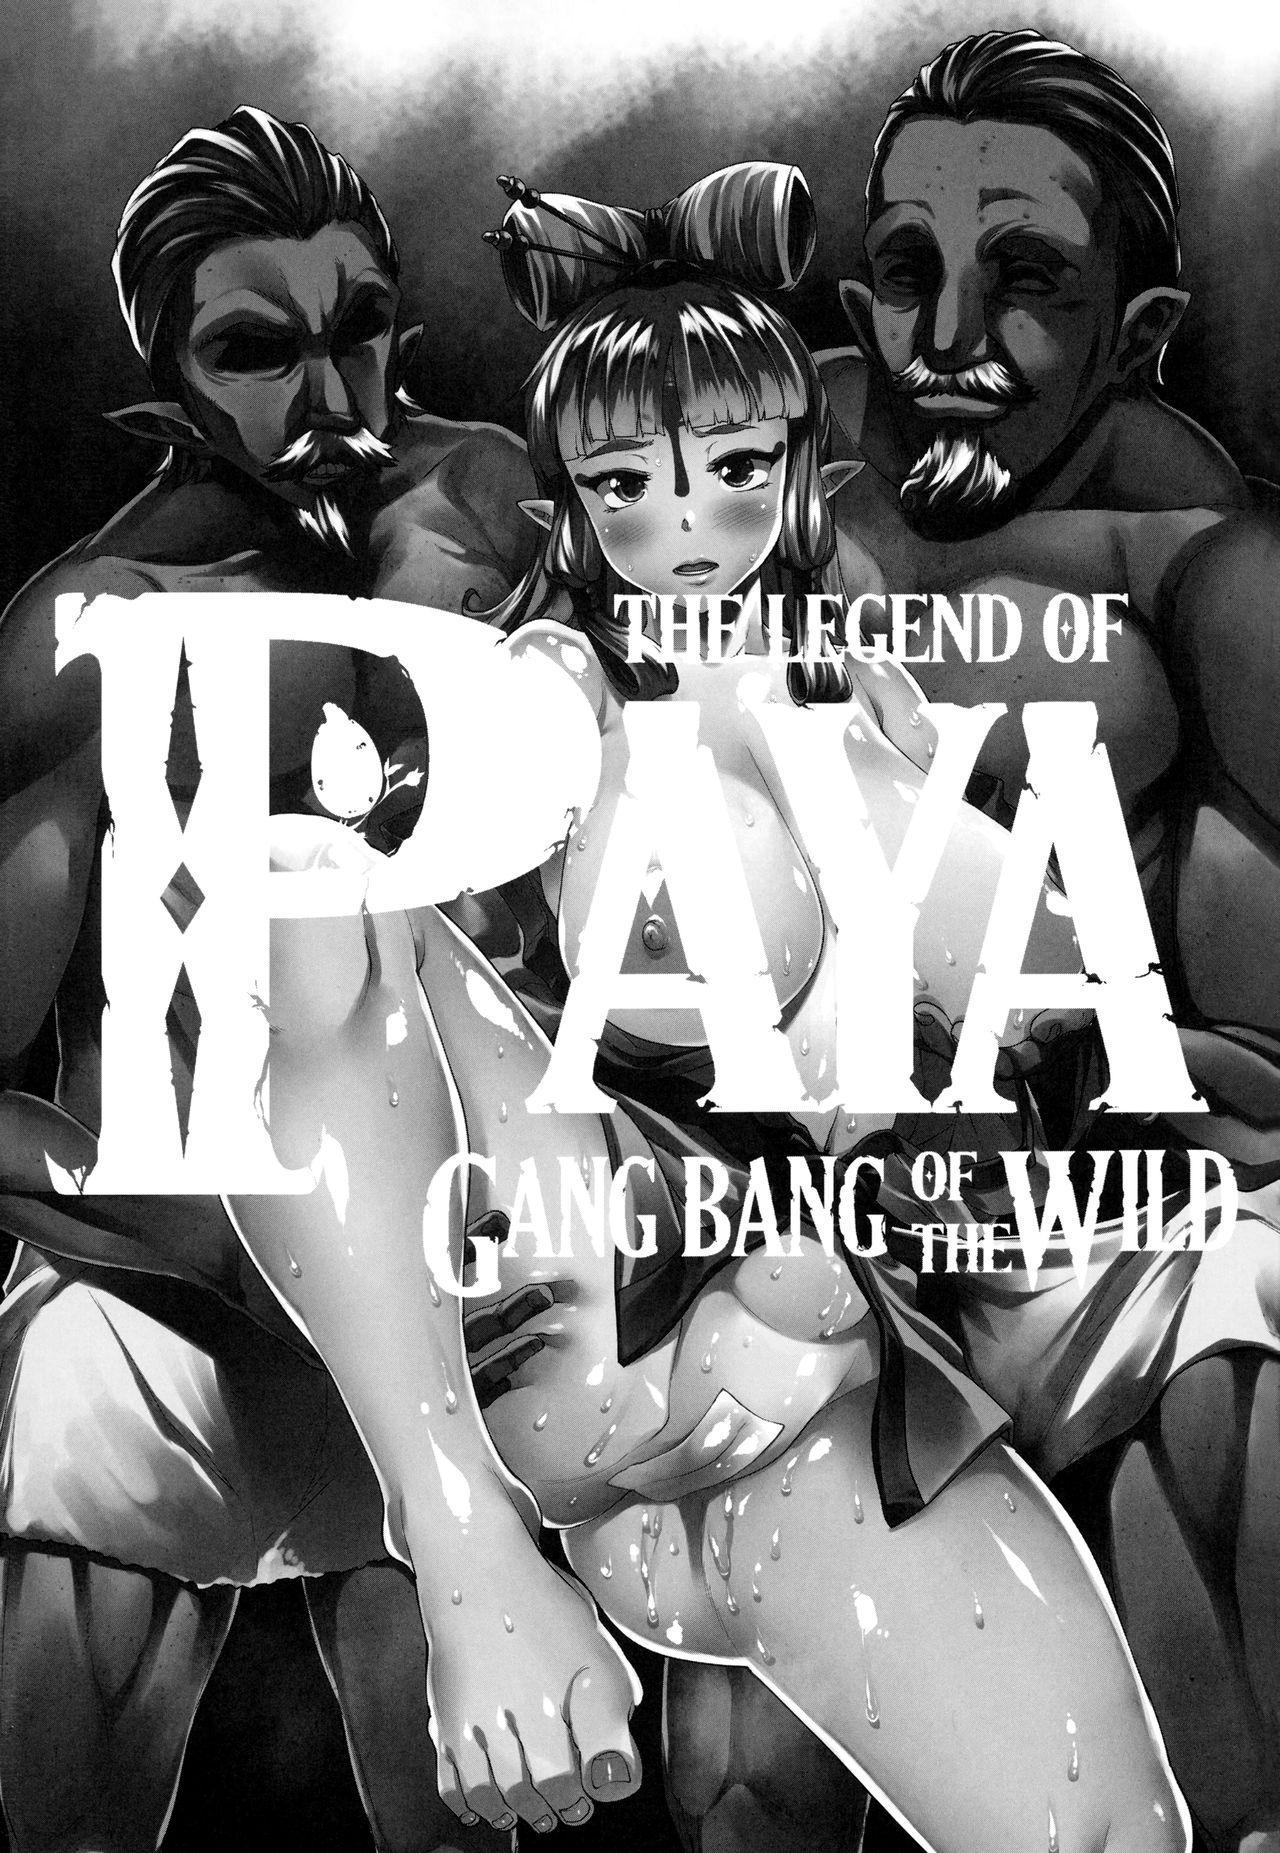 THE LEGEND OF PAYA GANG BANG OF THE WILD 1